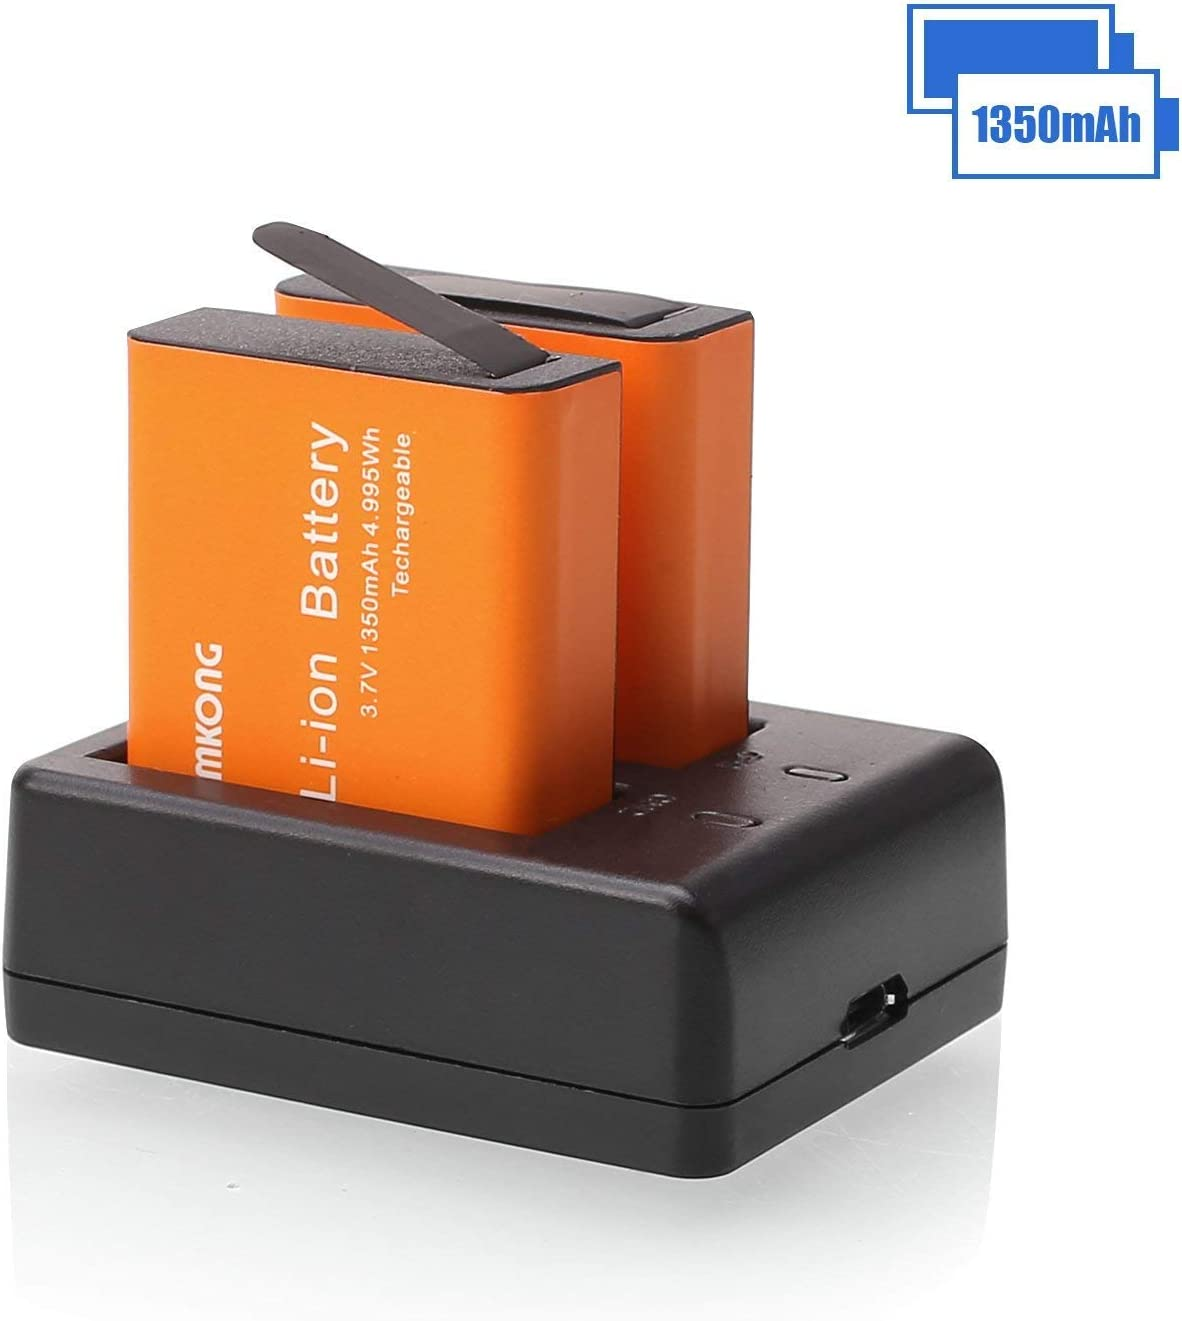 2X1350mAh Action Camera Battery Rechargeable for CAMKONG/AKASO EK7000/ APEMAN/SJCAM SJ4000 SJ5000 SJ6000 SJ7000/ ...